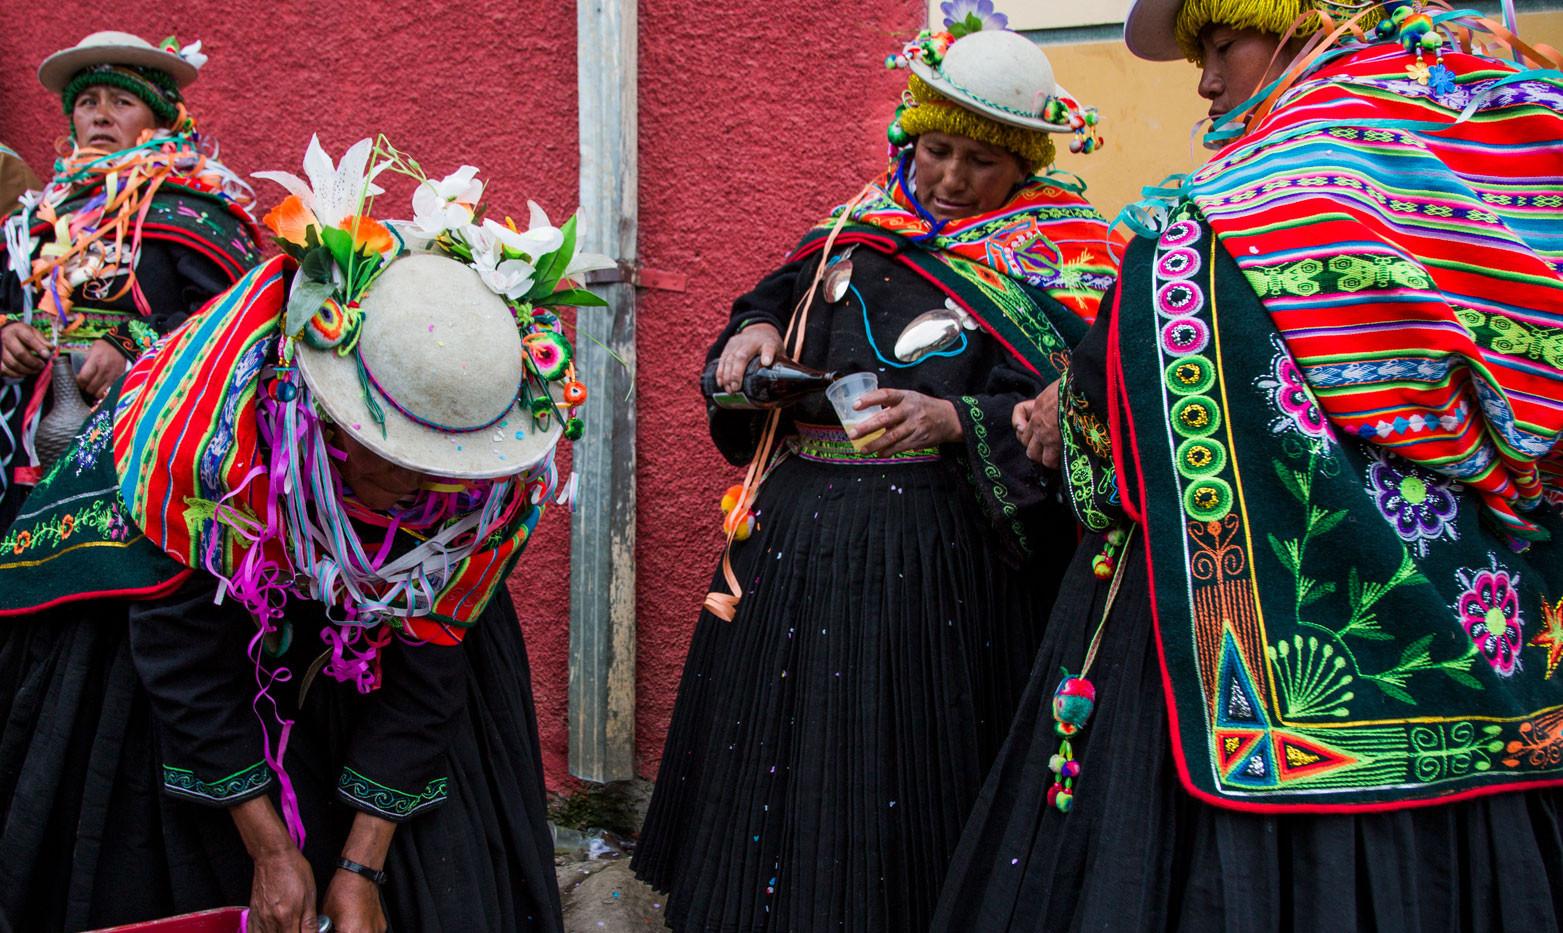 181114_MHP_Bolivia_3275.jpg